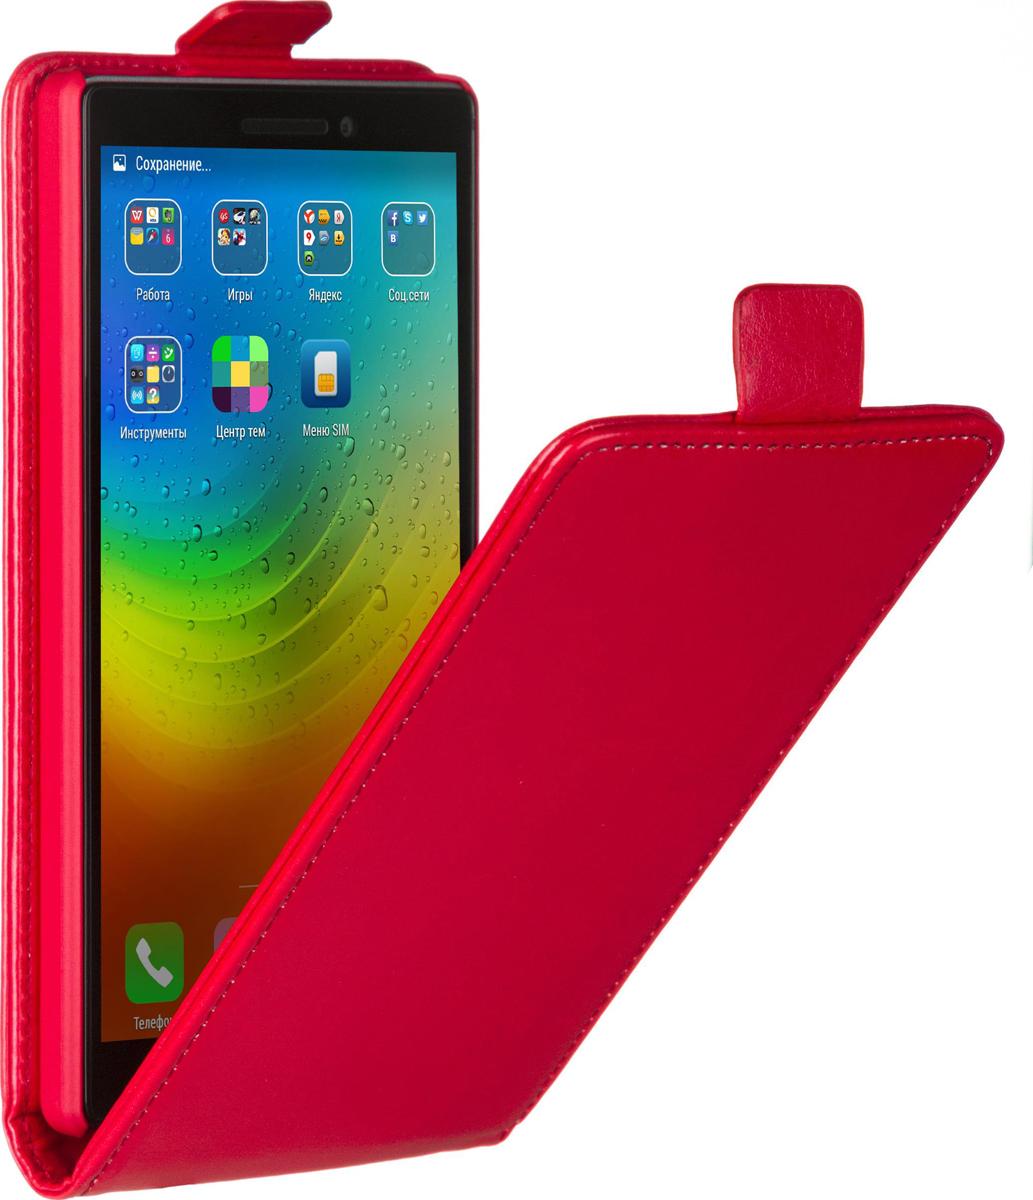 Skinbox Flip Case чехол для Lenovo Vibe X2, Red чехол для lenovo vibe c2 k10a40 skinbox 4people case черный